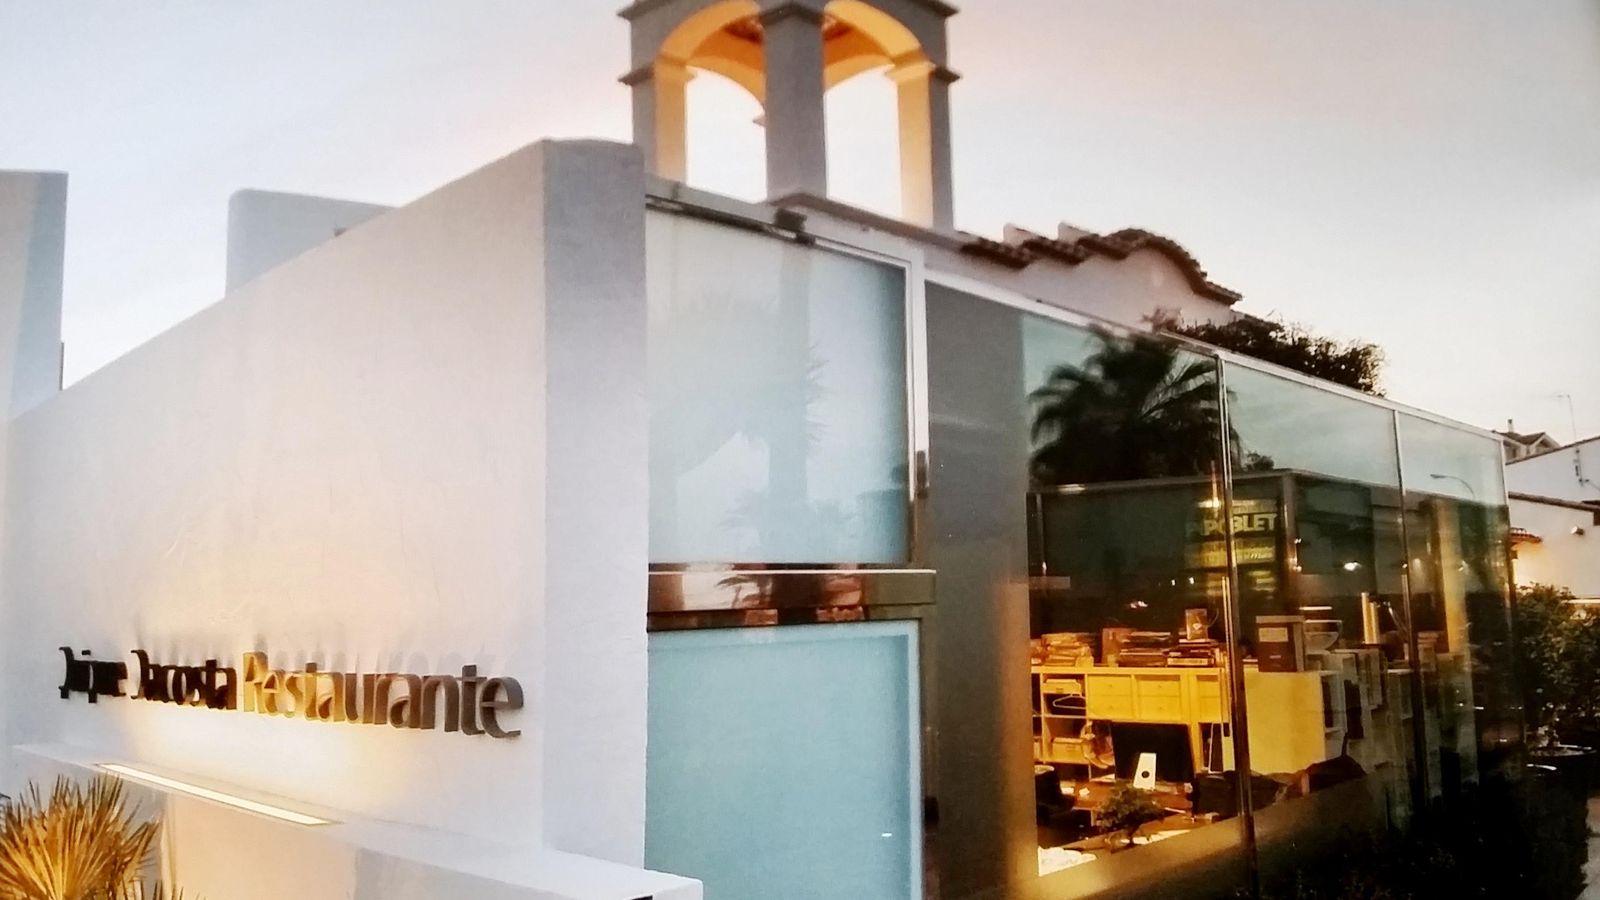 Restaurantes con estrella michelin quique dacosta la for Estrella michelin cocina